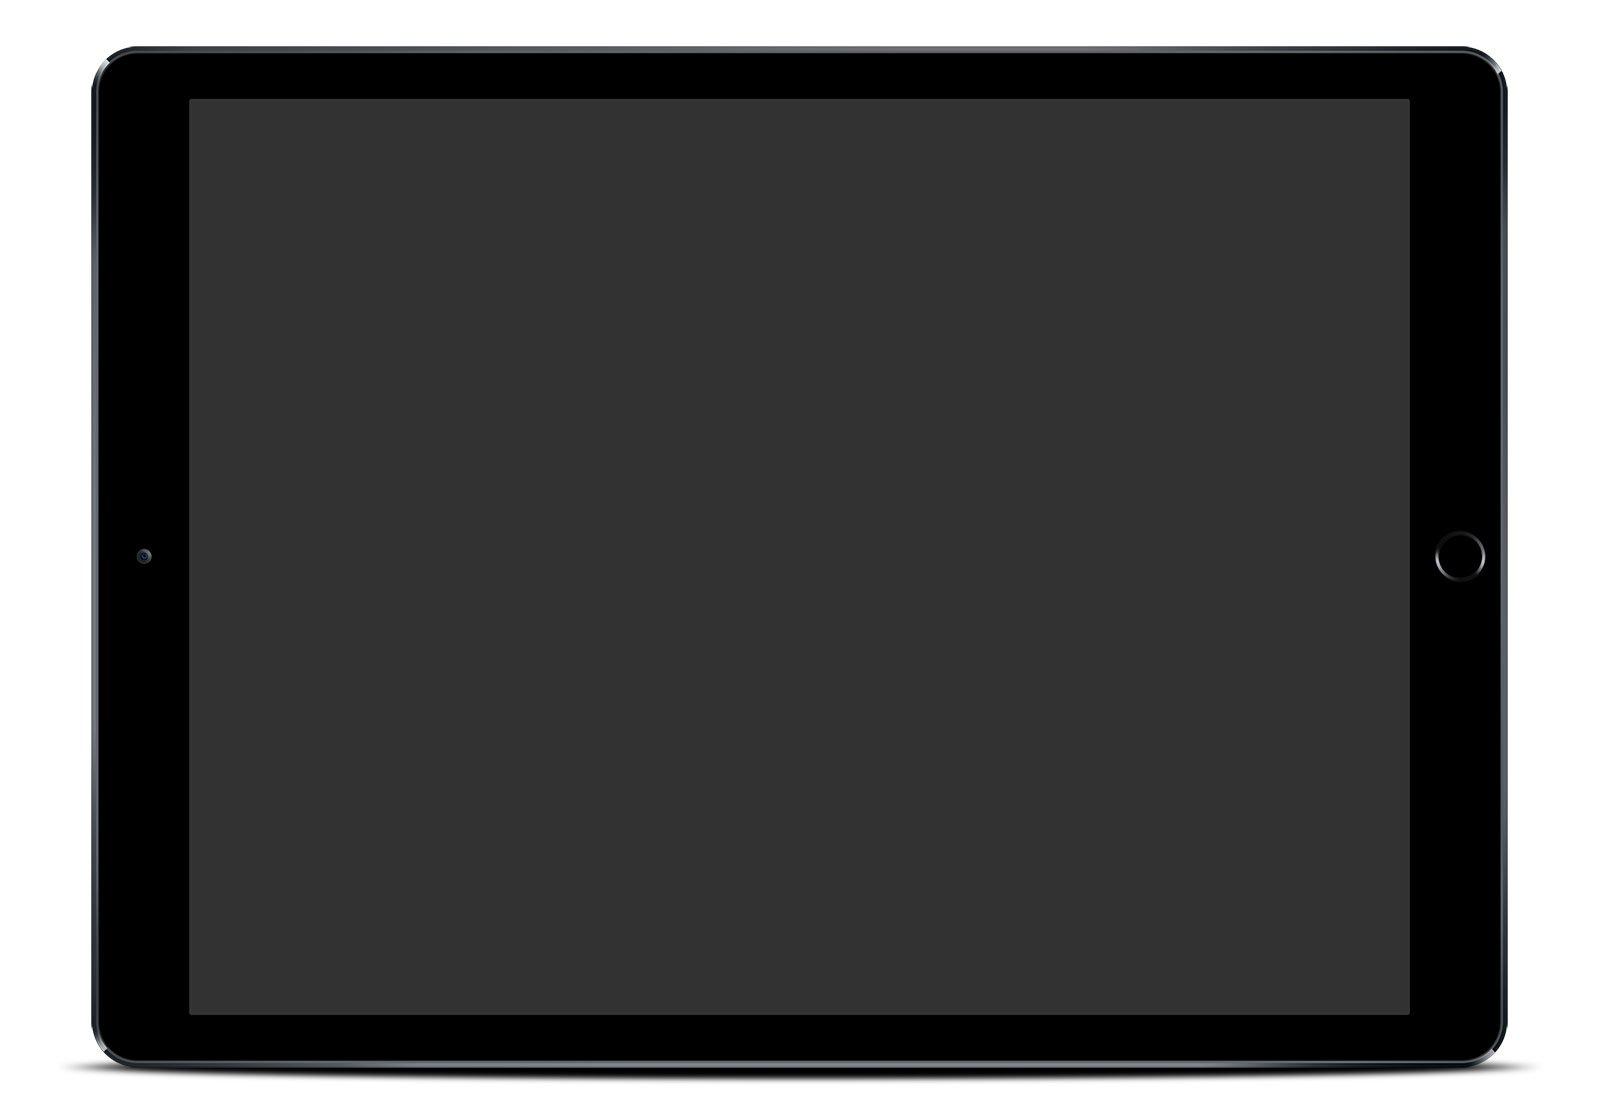 iPad Frame